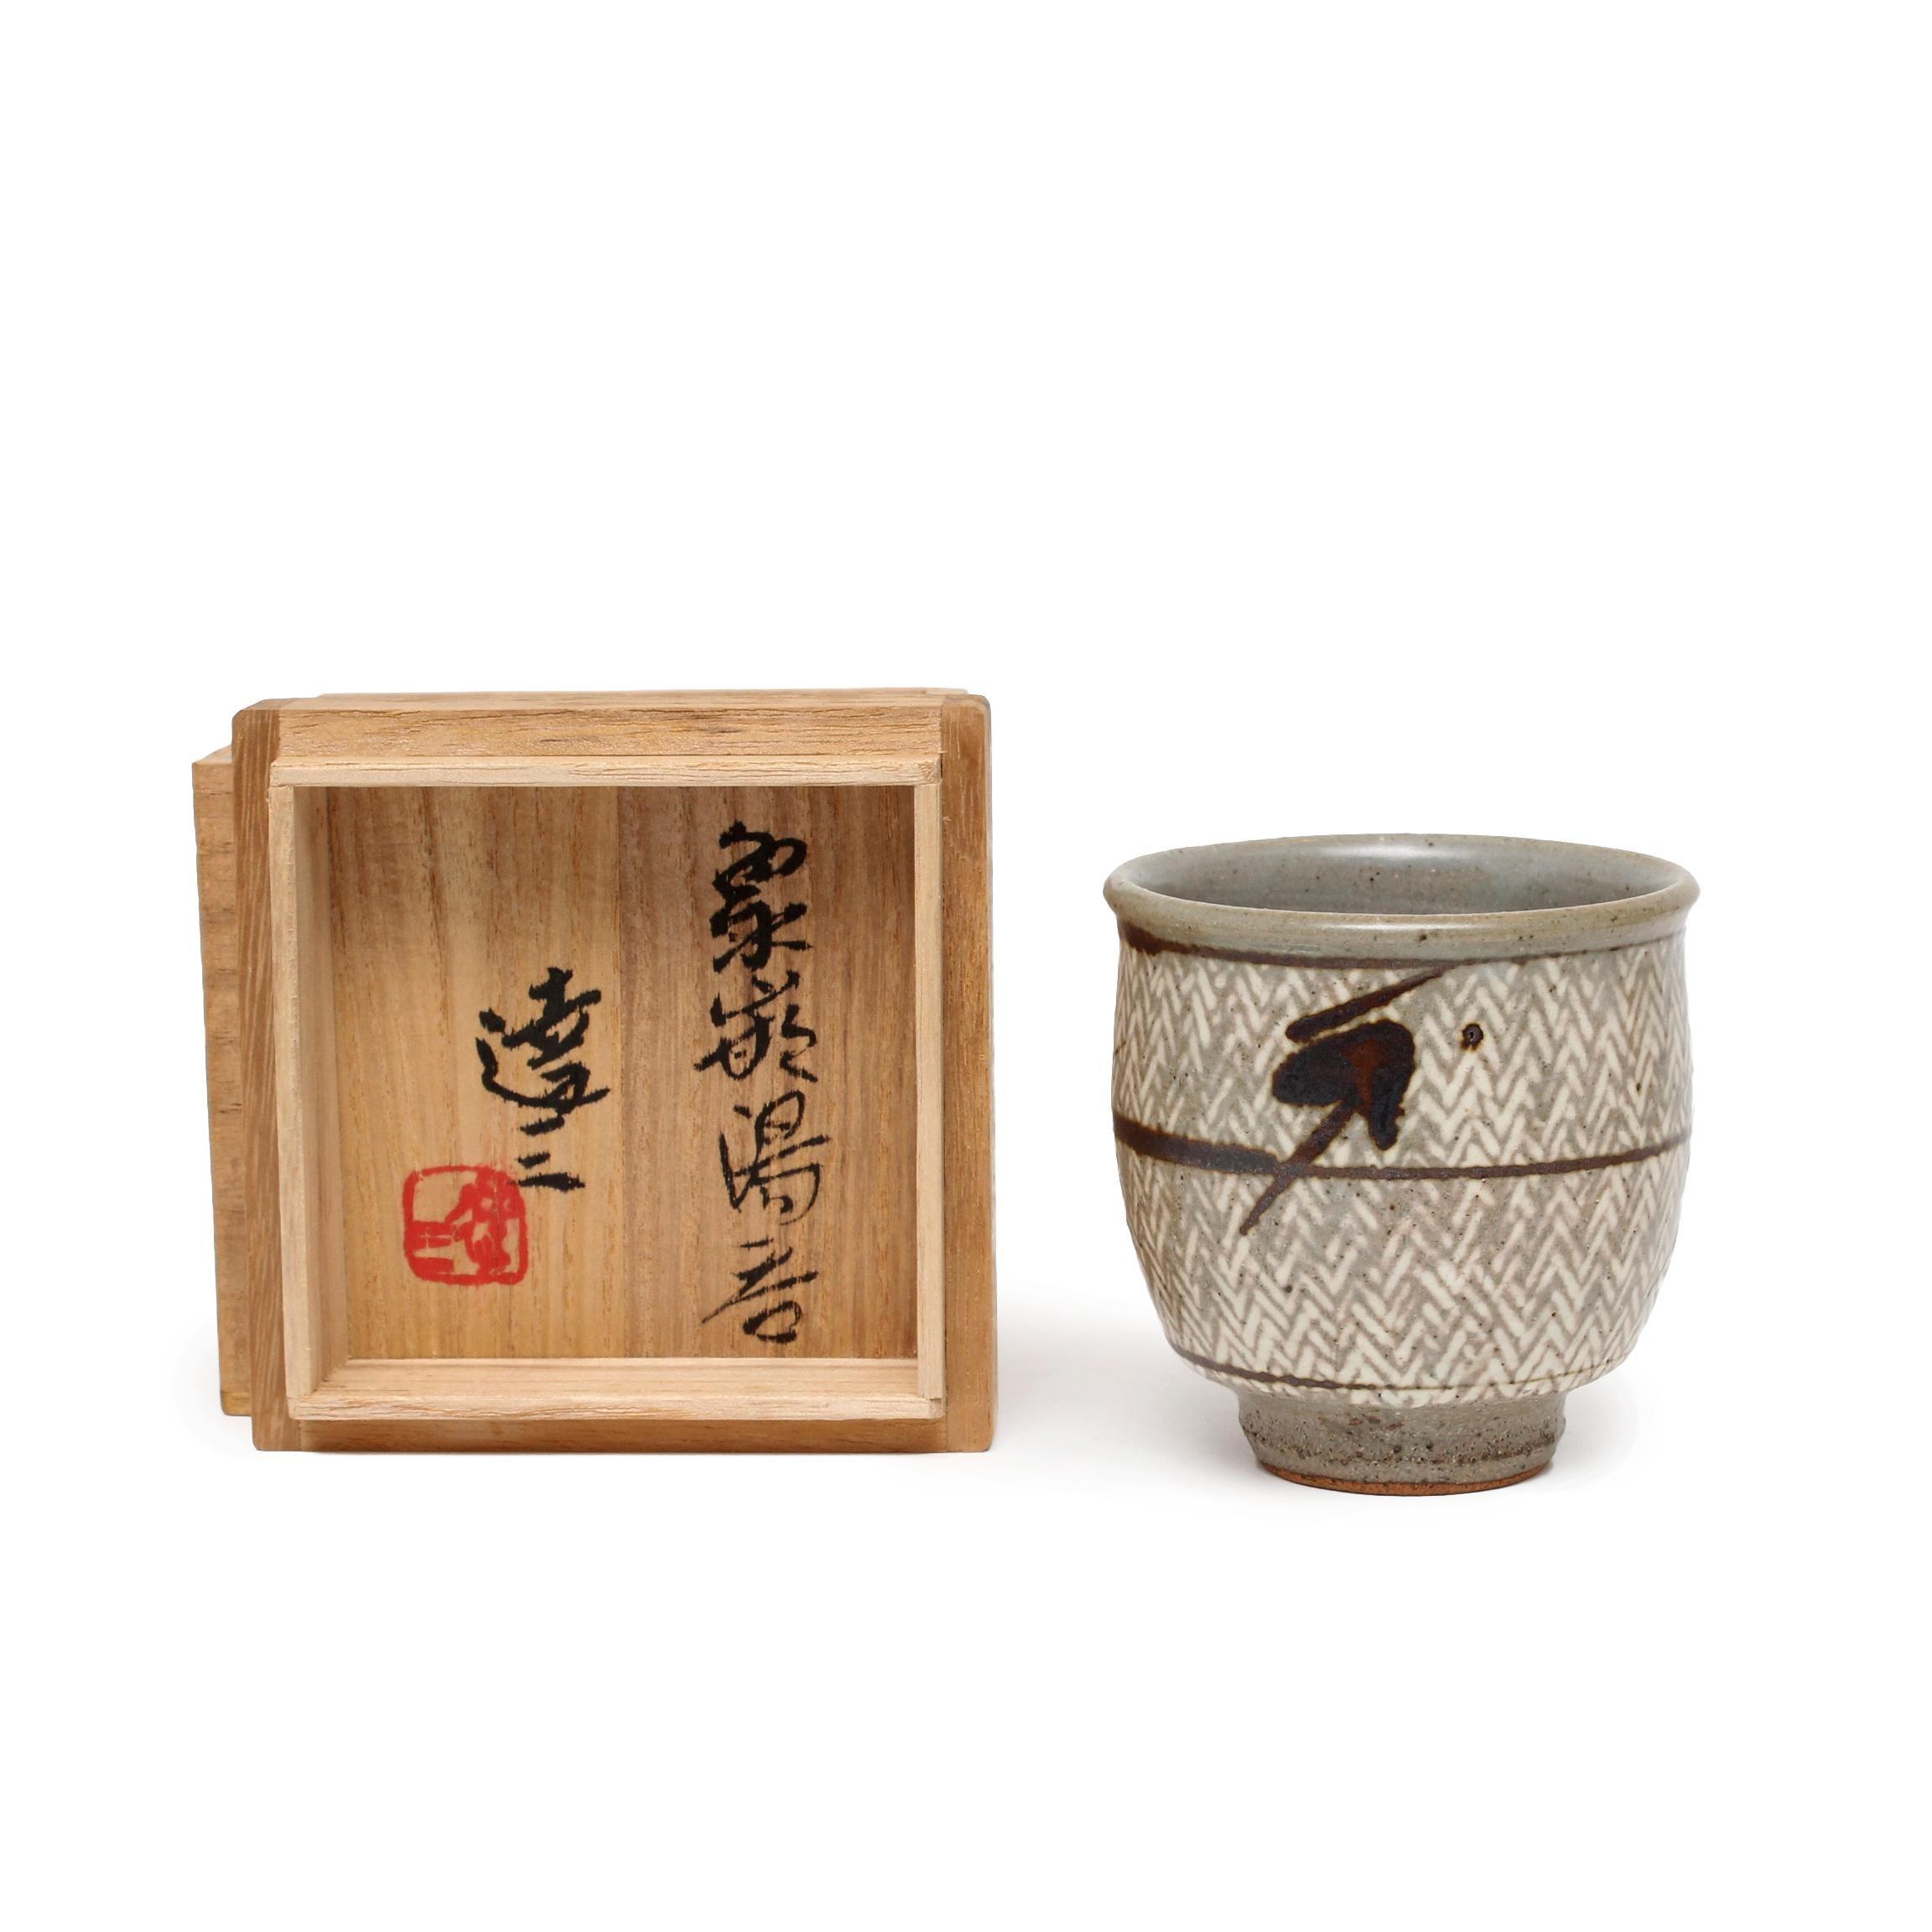 Yunomi with Signed Box by Tatsuzo Shimaoka (INV# NP2798)